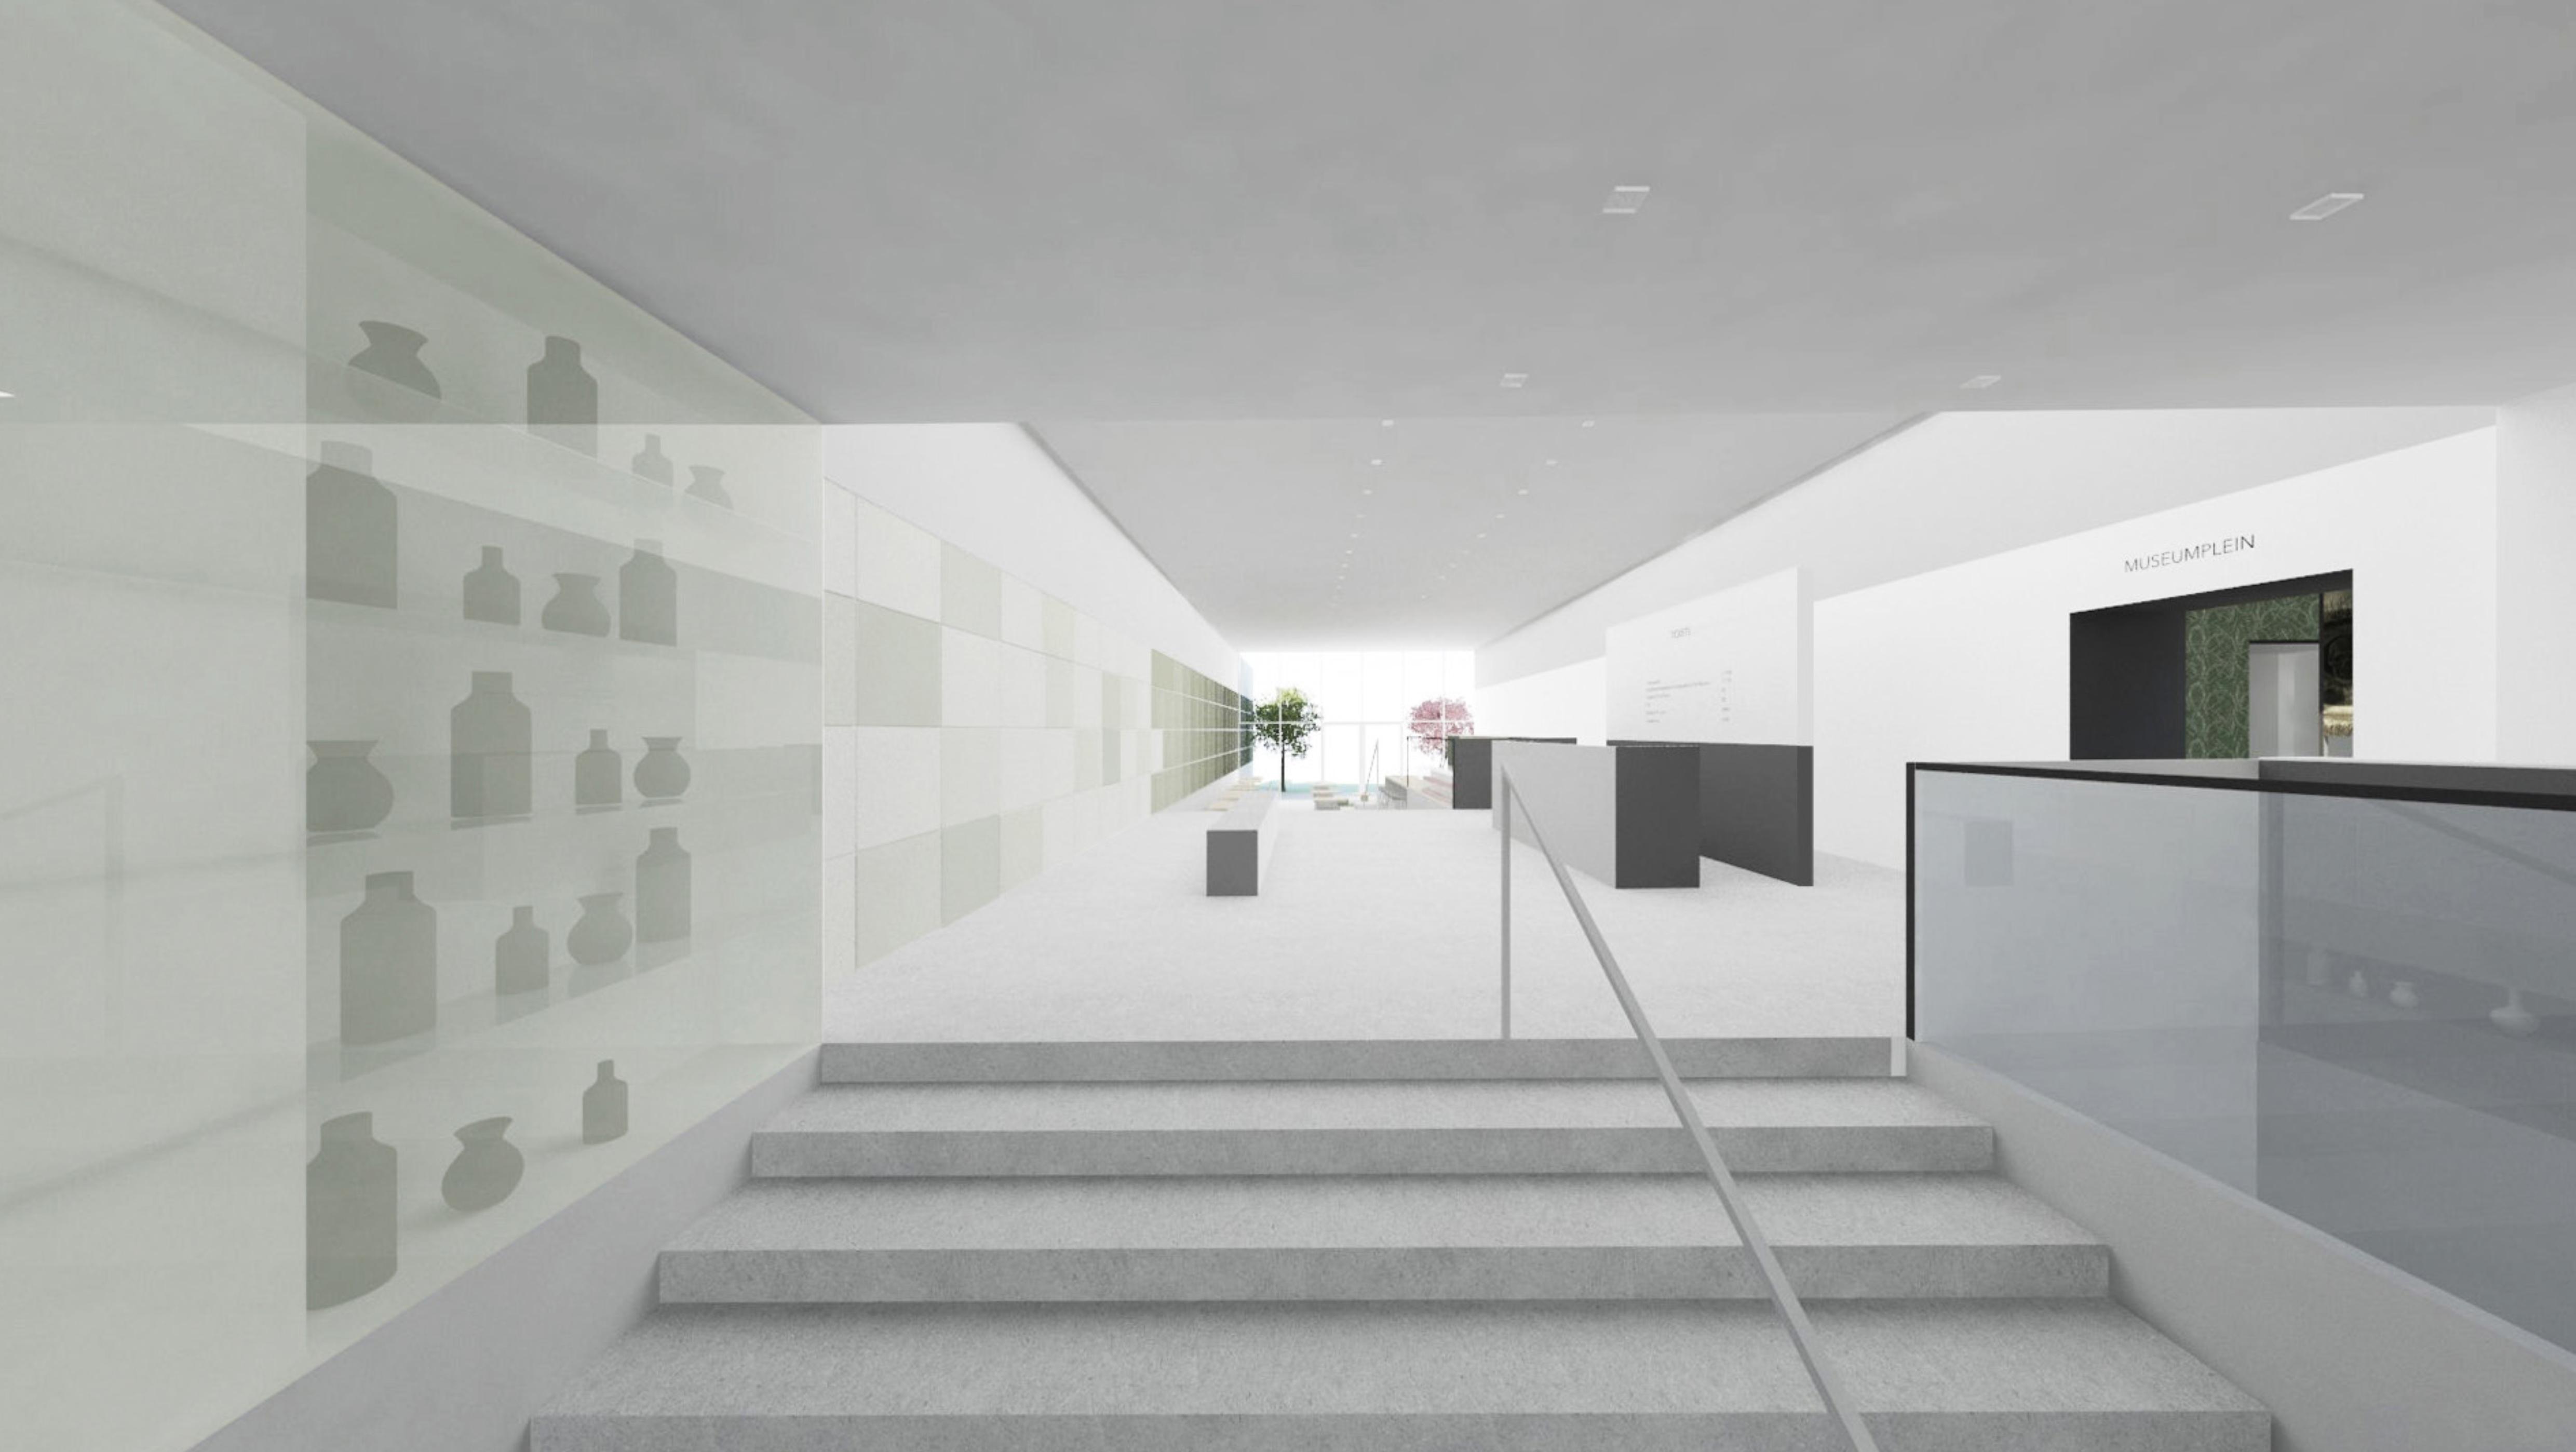 Keramiekmuseum 2